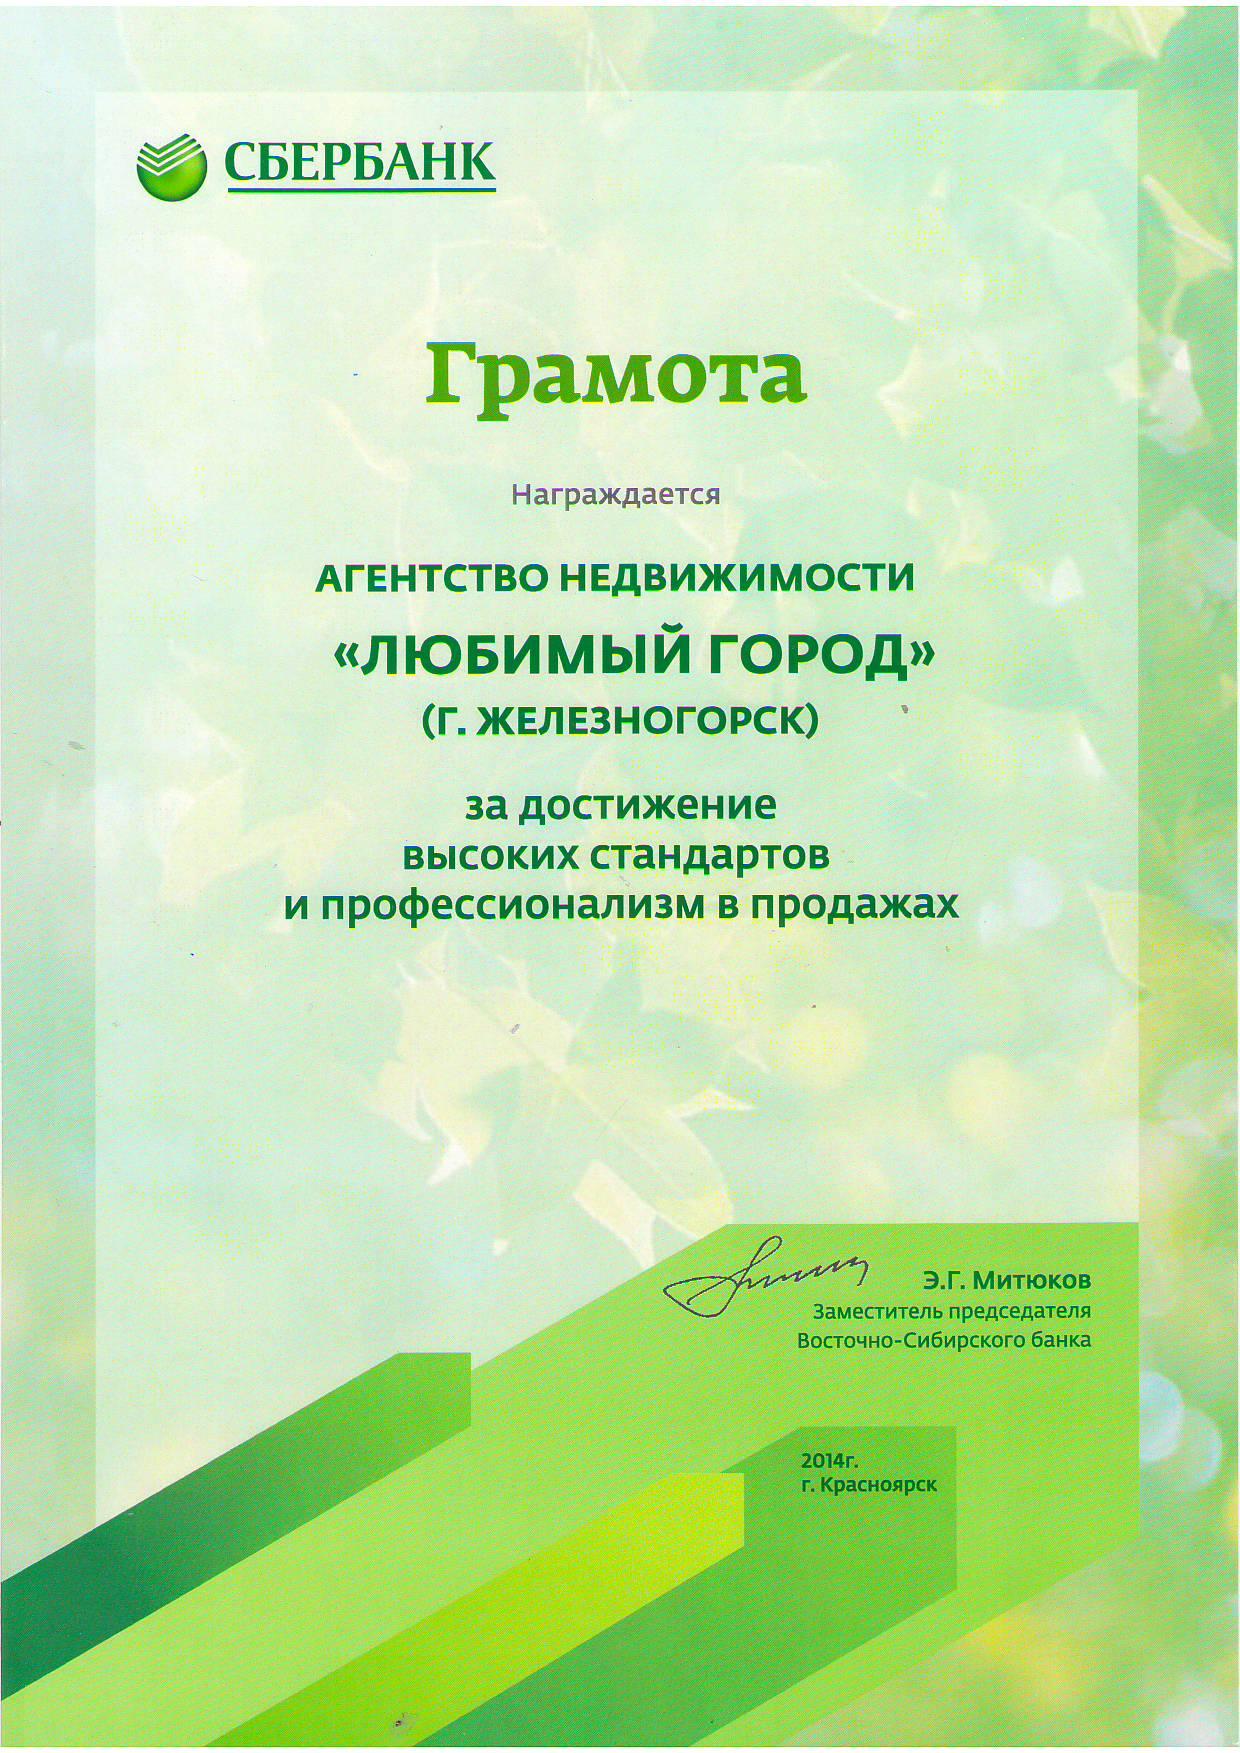 Новостройки Красноярска от застройщика планировки и цены